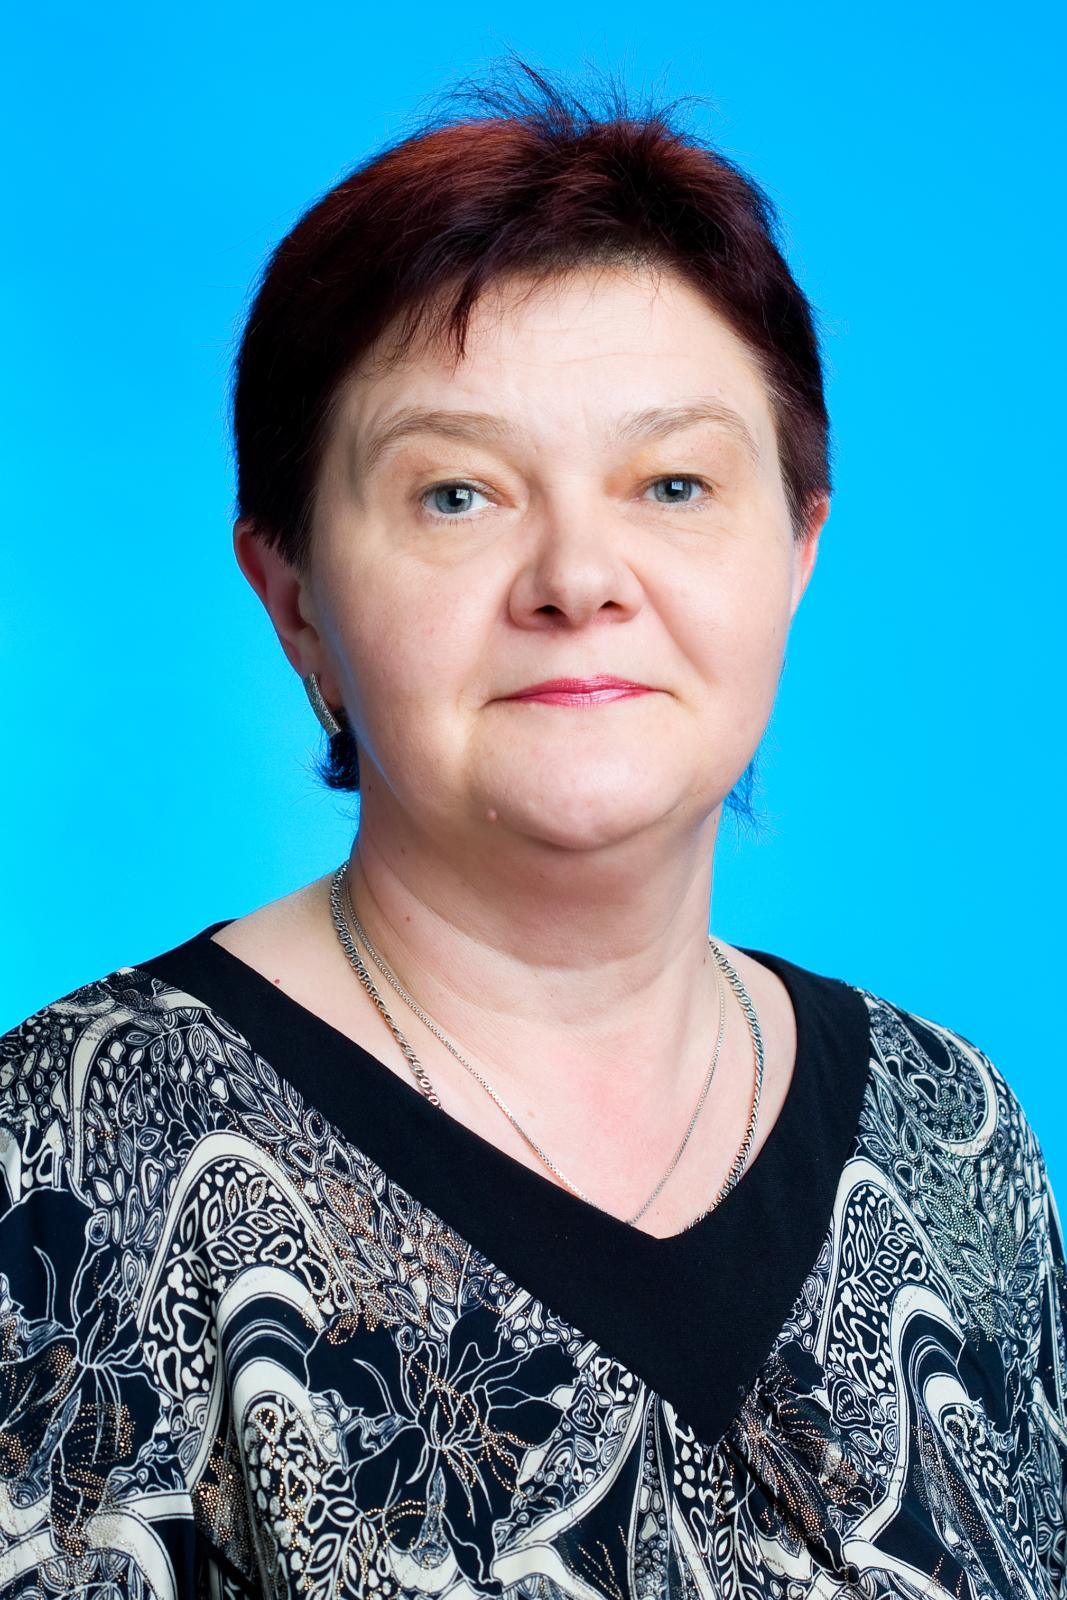 Marina Kosar